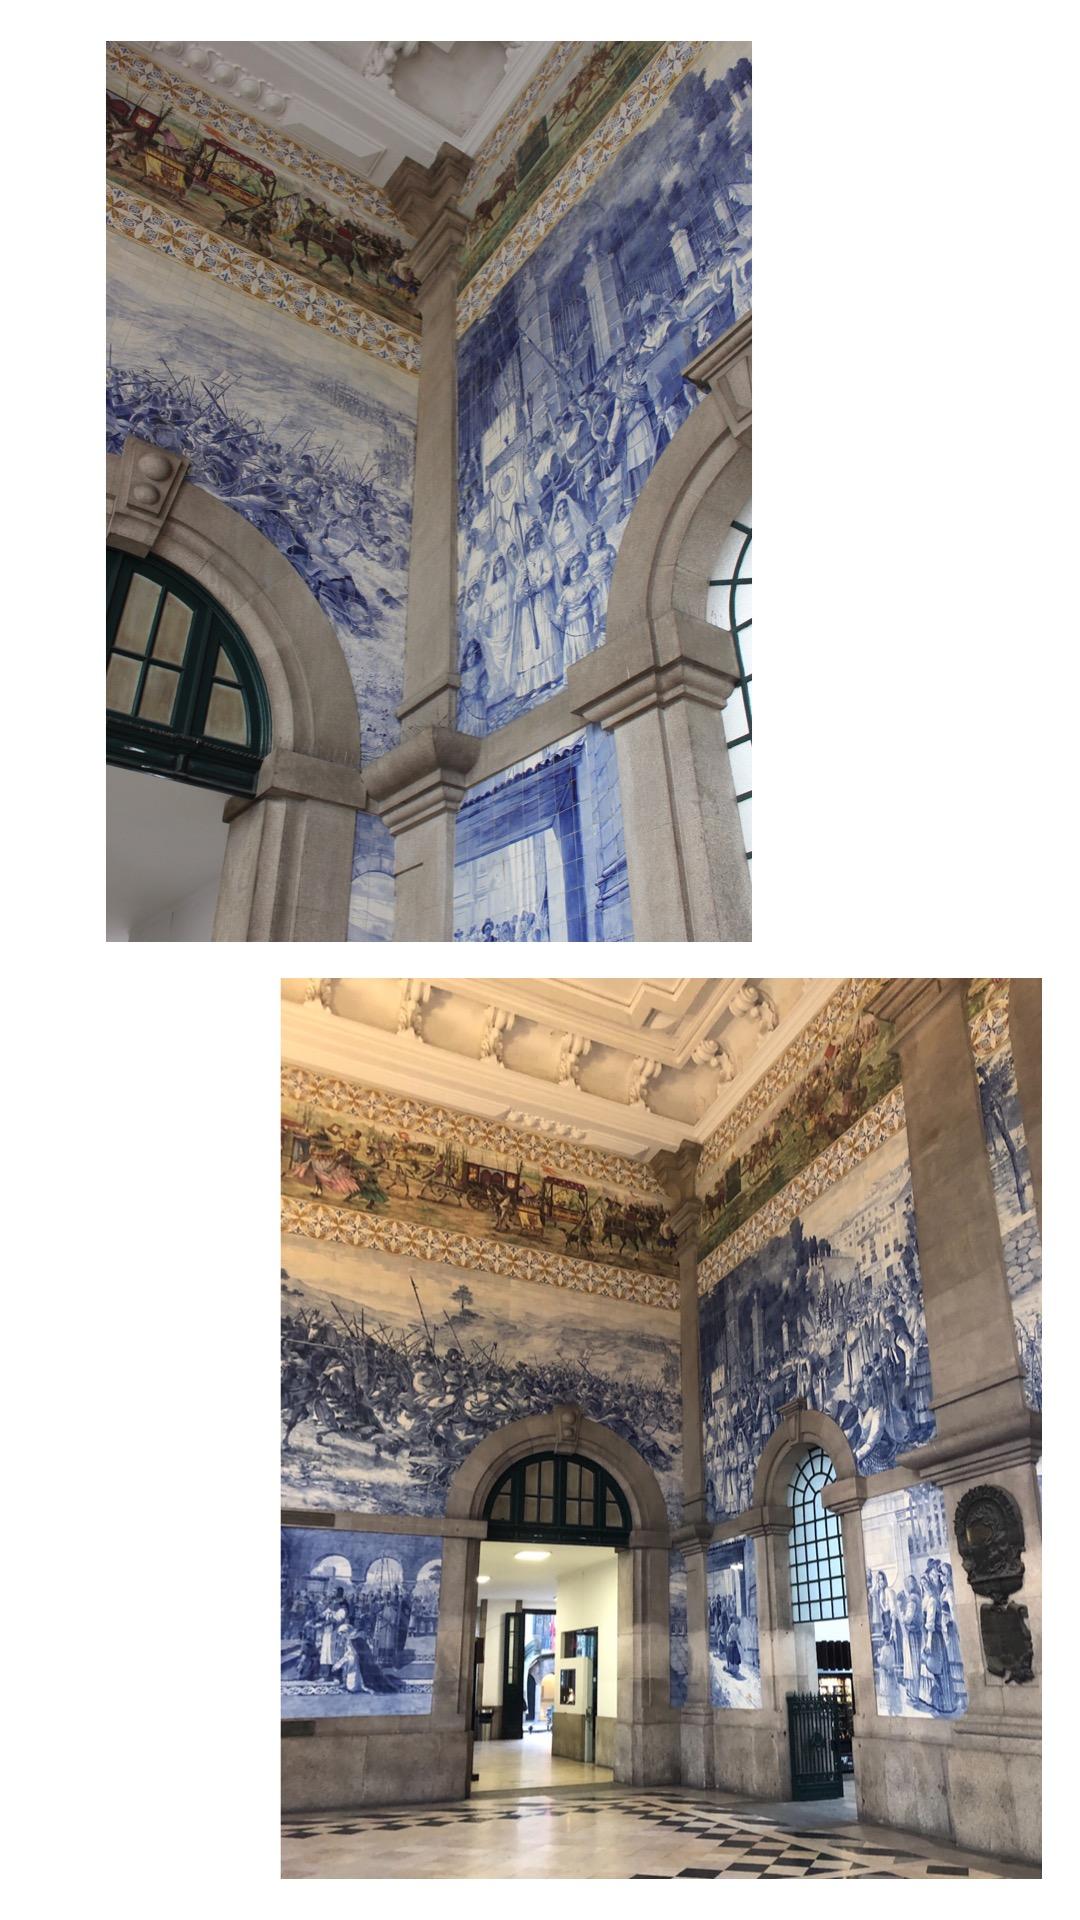 Porto-Reisebericht-Sightseeing-Tipps-Bahnhof-Sao-Bento-Azulejos-Wandkacheln-Miss-Suzie-Loves